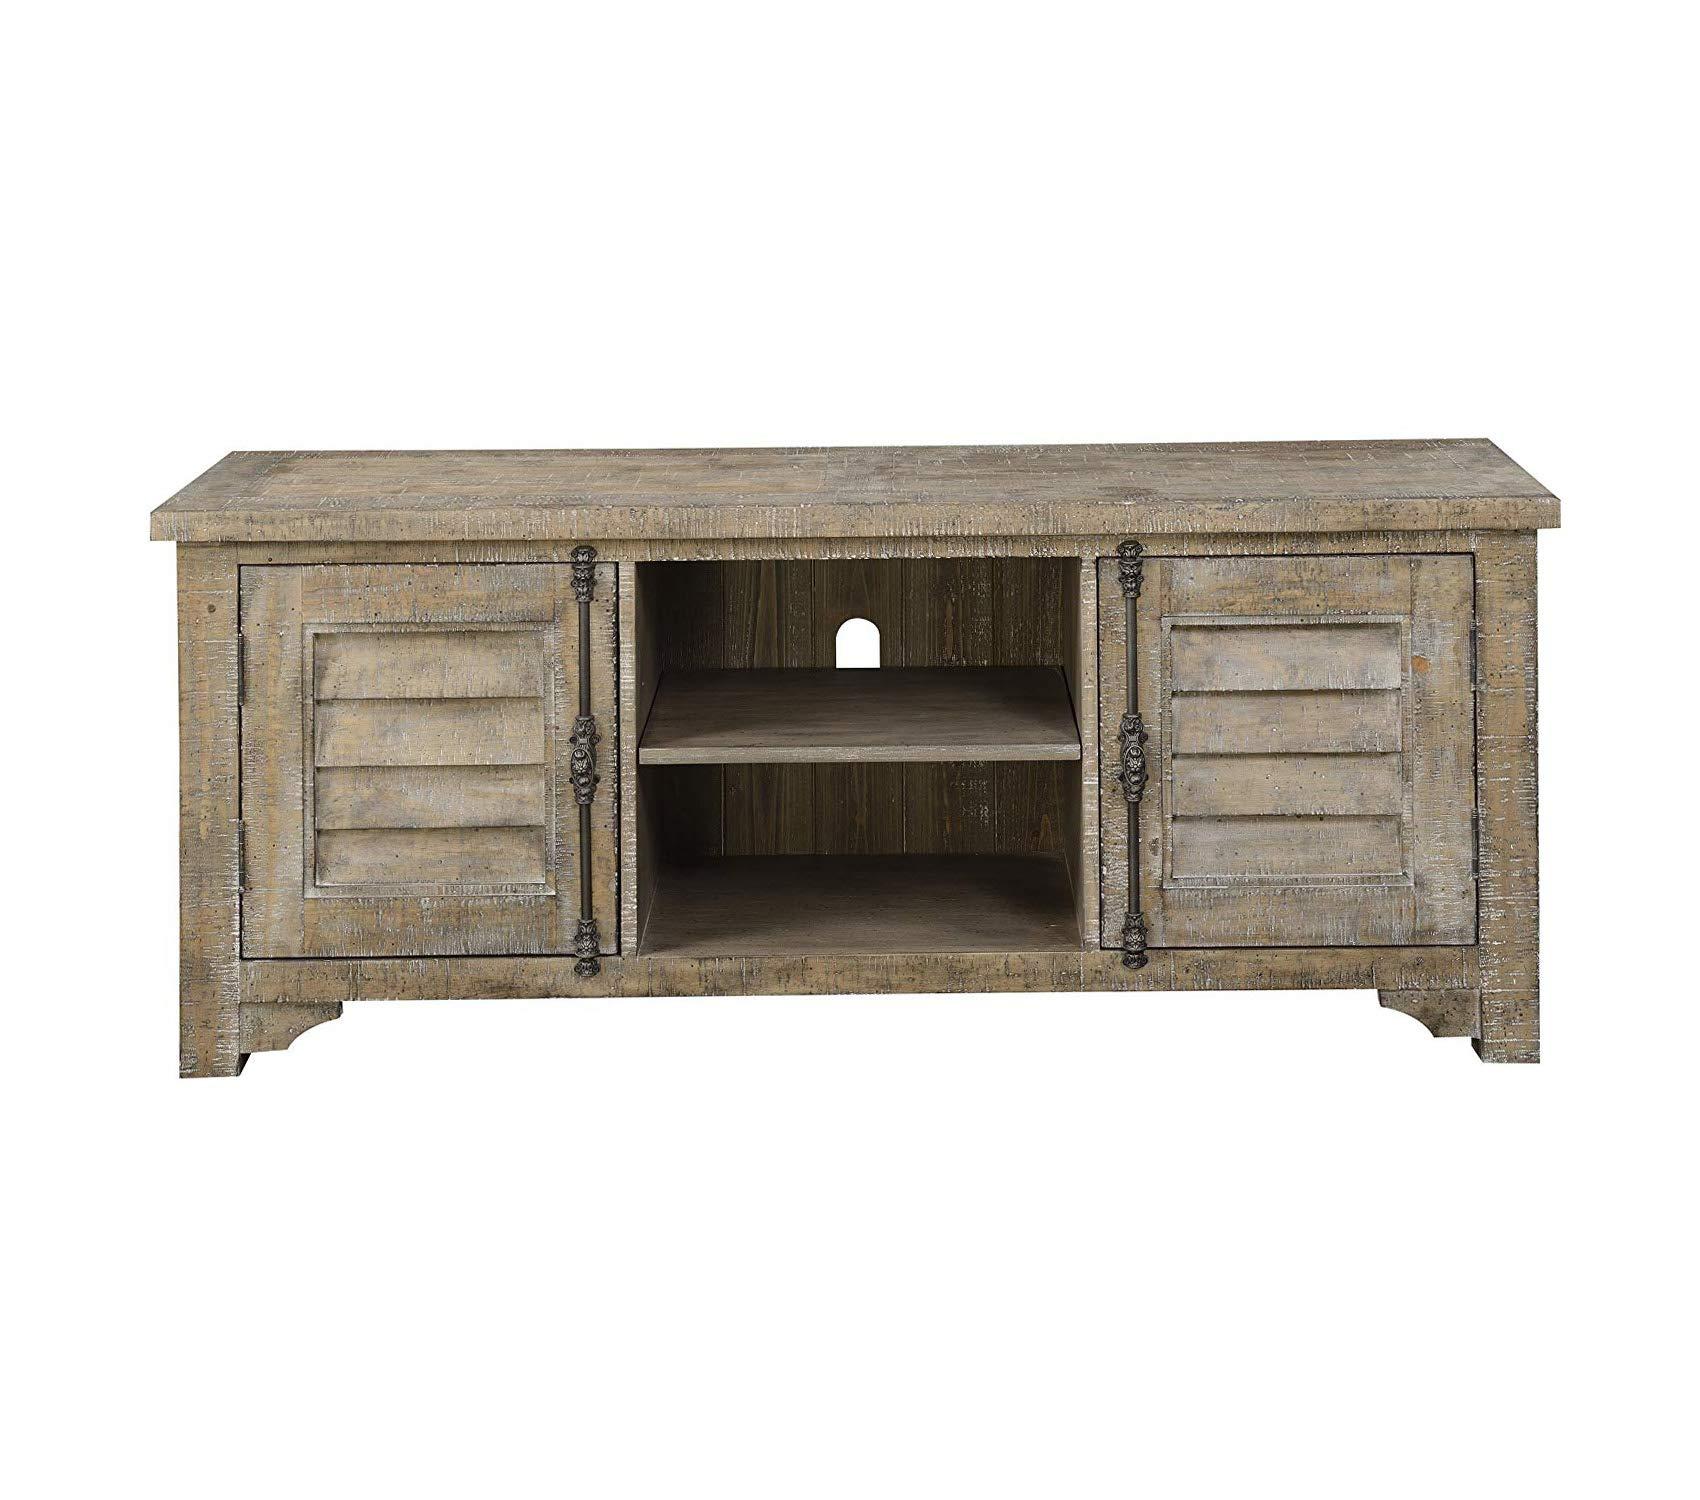 Еmеrаld Hоmе Furnishings Deluxe Premium Collection Interlude TV Entertainment Consoles Standard Sandstone Gray Decor Comfy Living Furniture by Еmеrаld Hоmе Furnishings